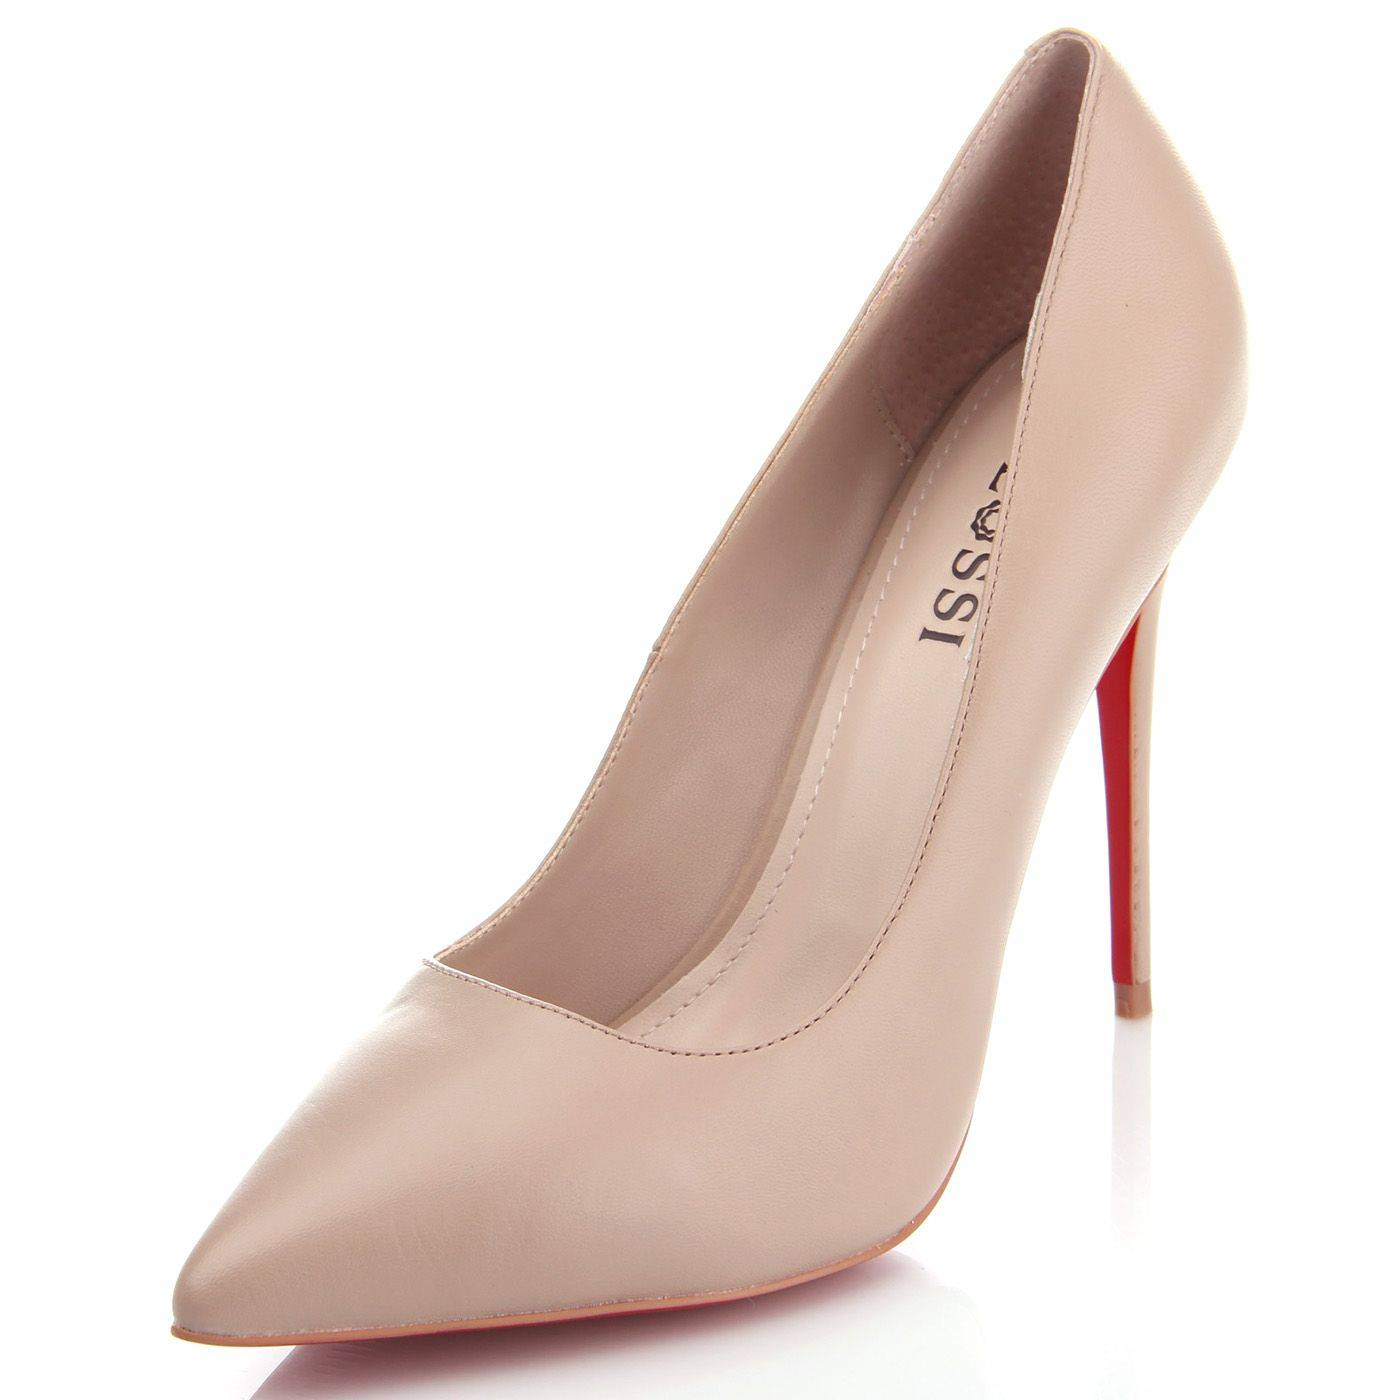 Туфлі жіночі Glossi 3310 Бежевий купить по выгодной цене в интернет ... eeb4ef45e67ea